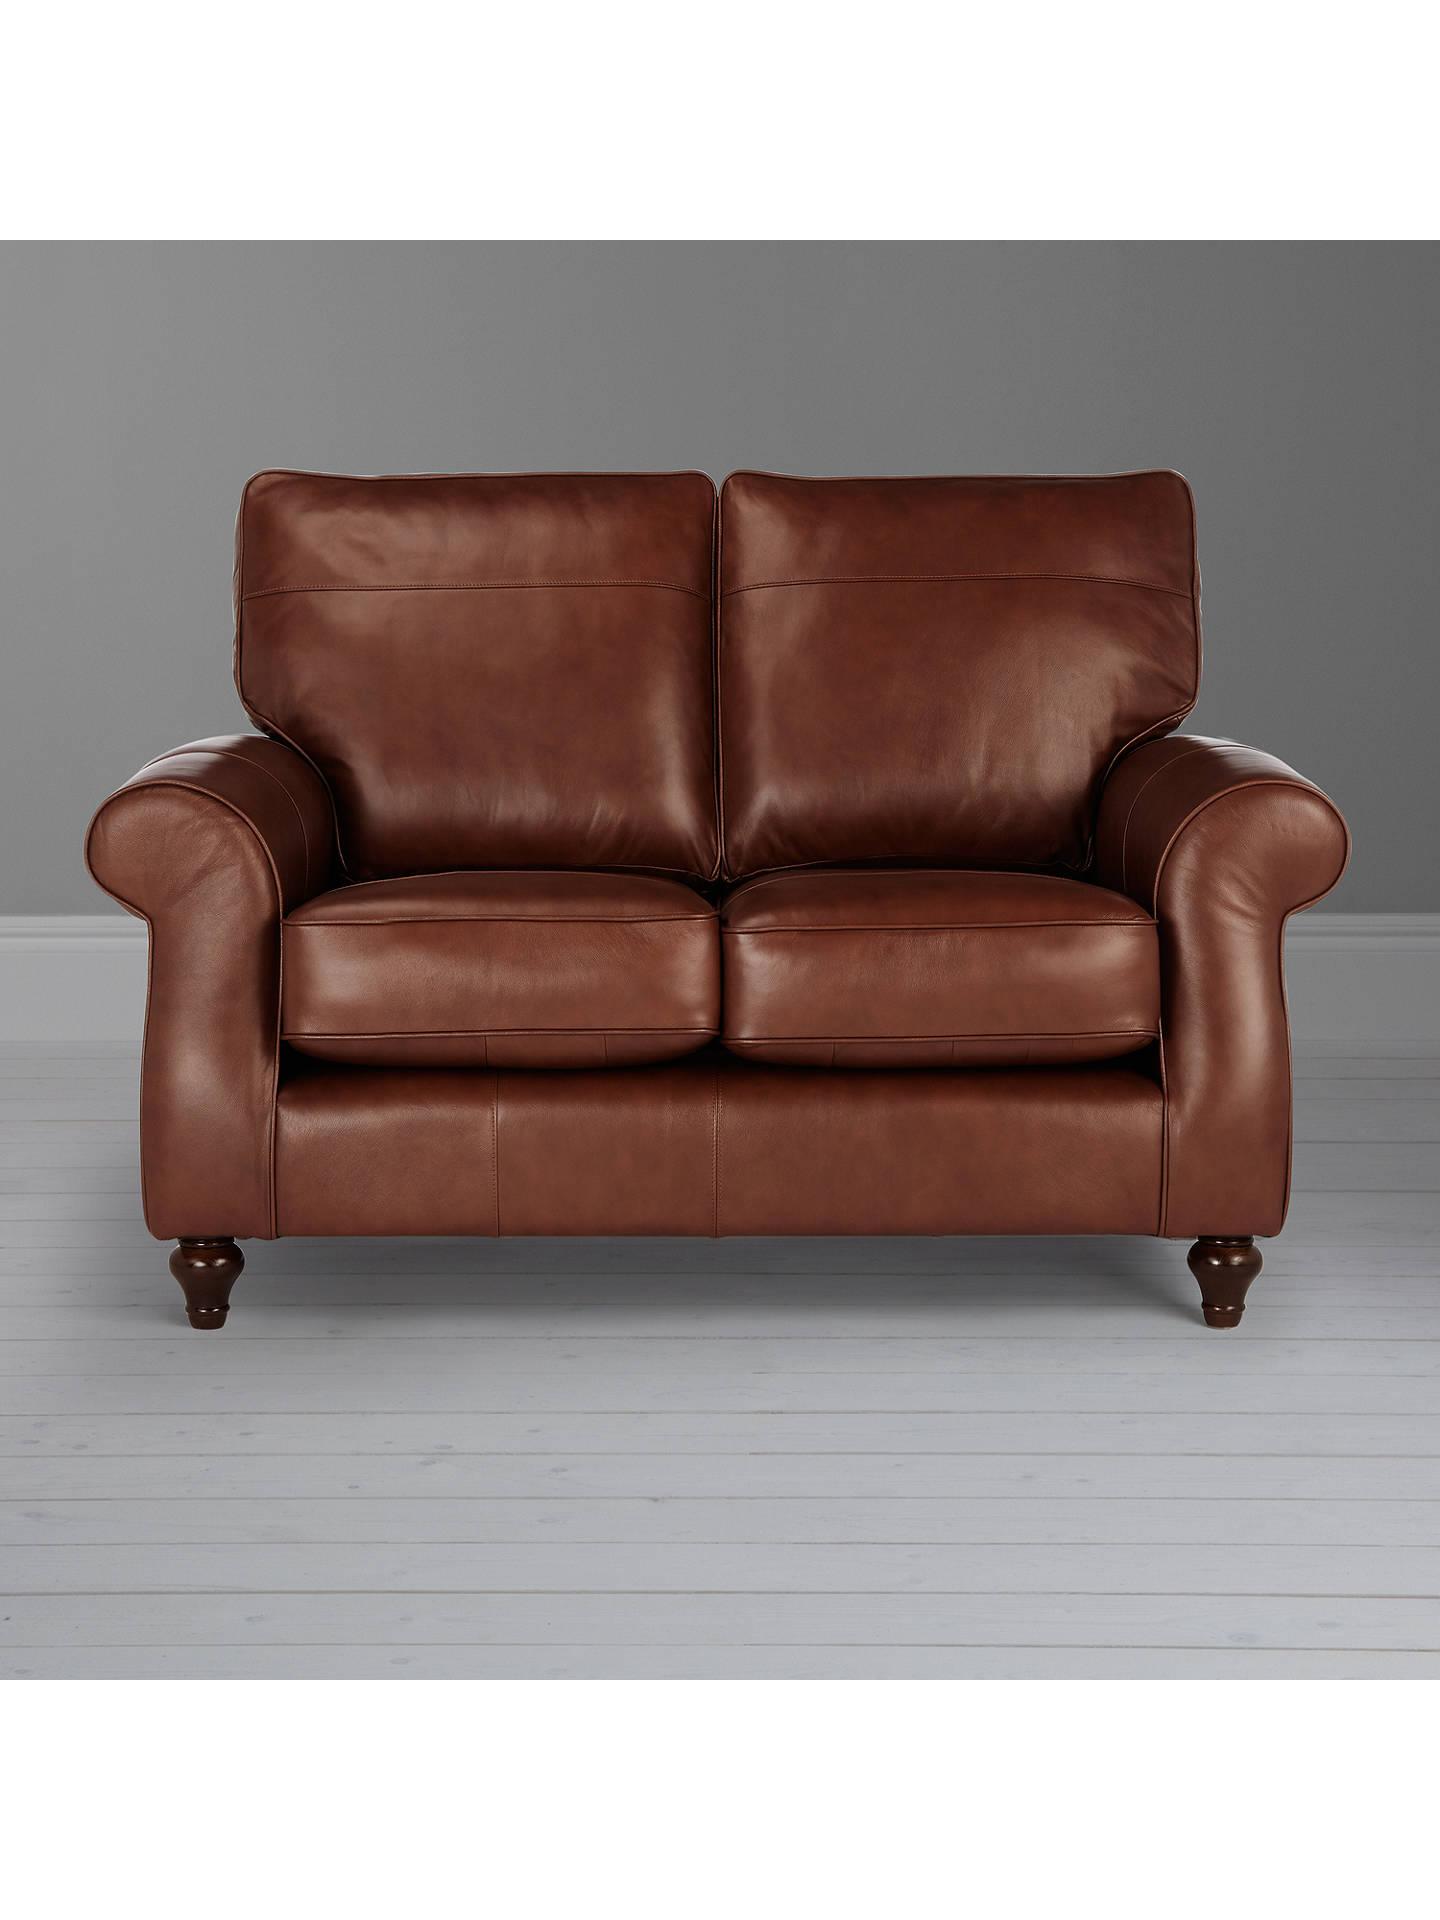 Strange John Lewis Hannah Small 2 Seater Leather Sofa Dark Leg At Download Free Architecture Designs Scobabritishbridgeorg